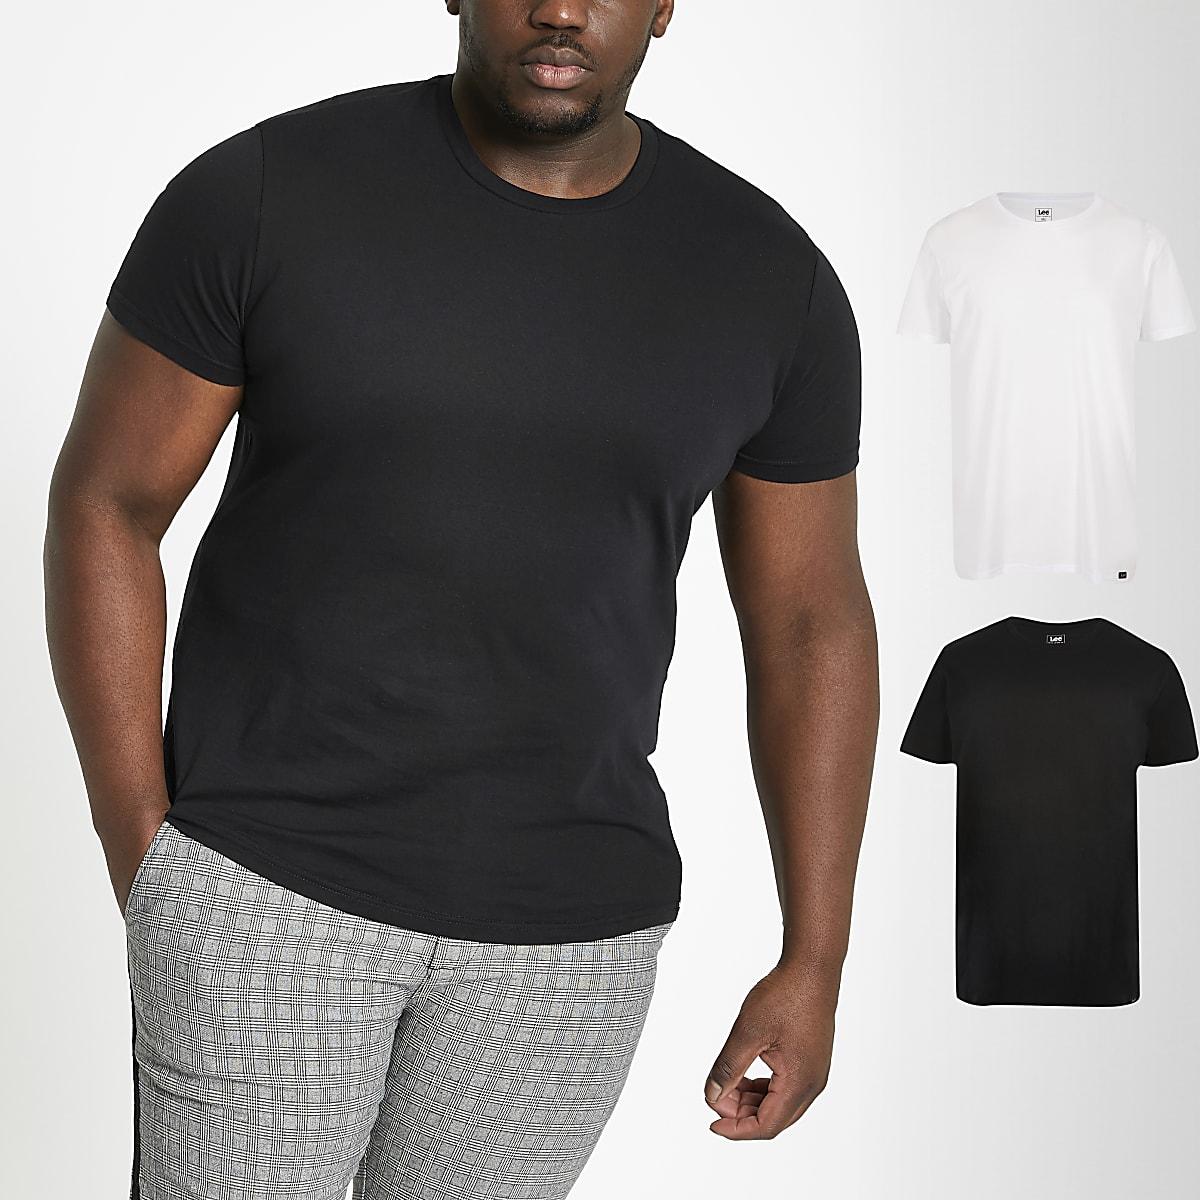 Lee – Big and Tall – Lot de 2 t-shirts multicolores